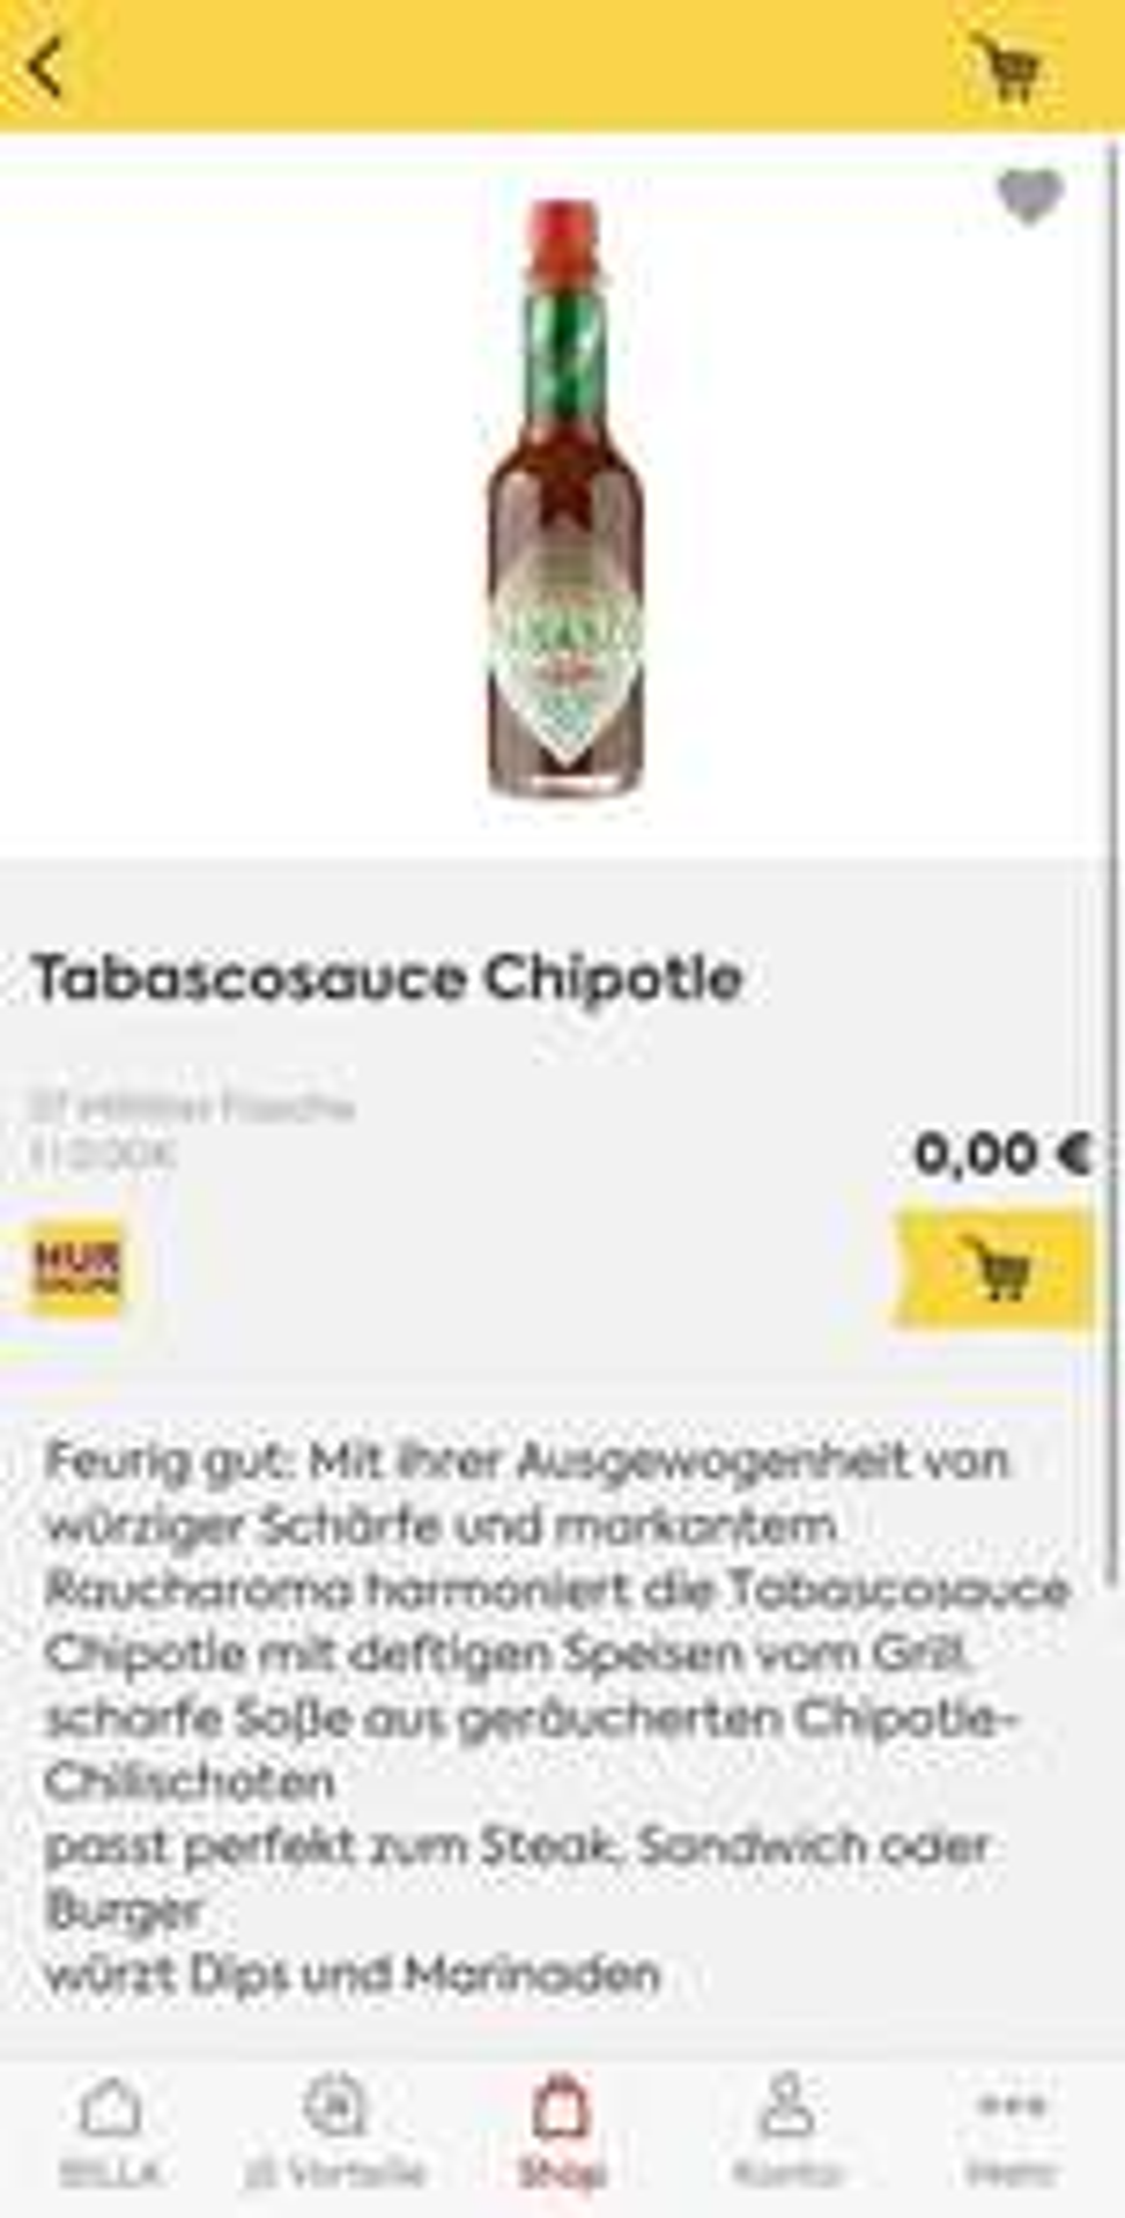 Tabascosauce Chipotle Preisfehler?! @BILLA Onlineshop